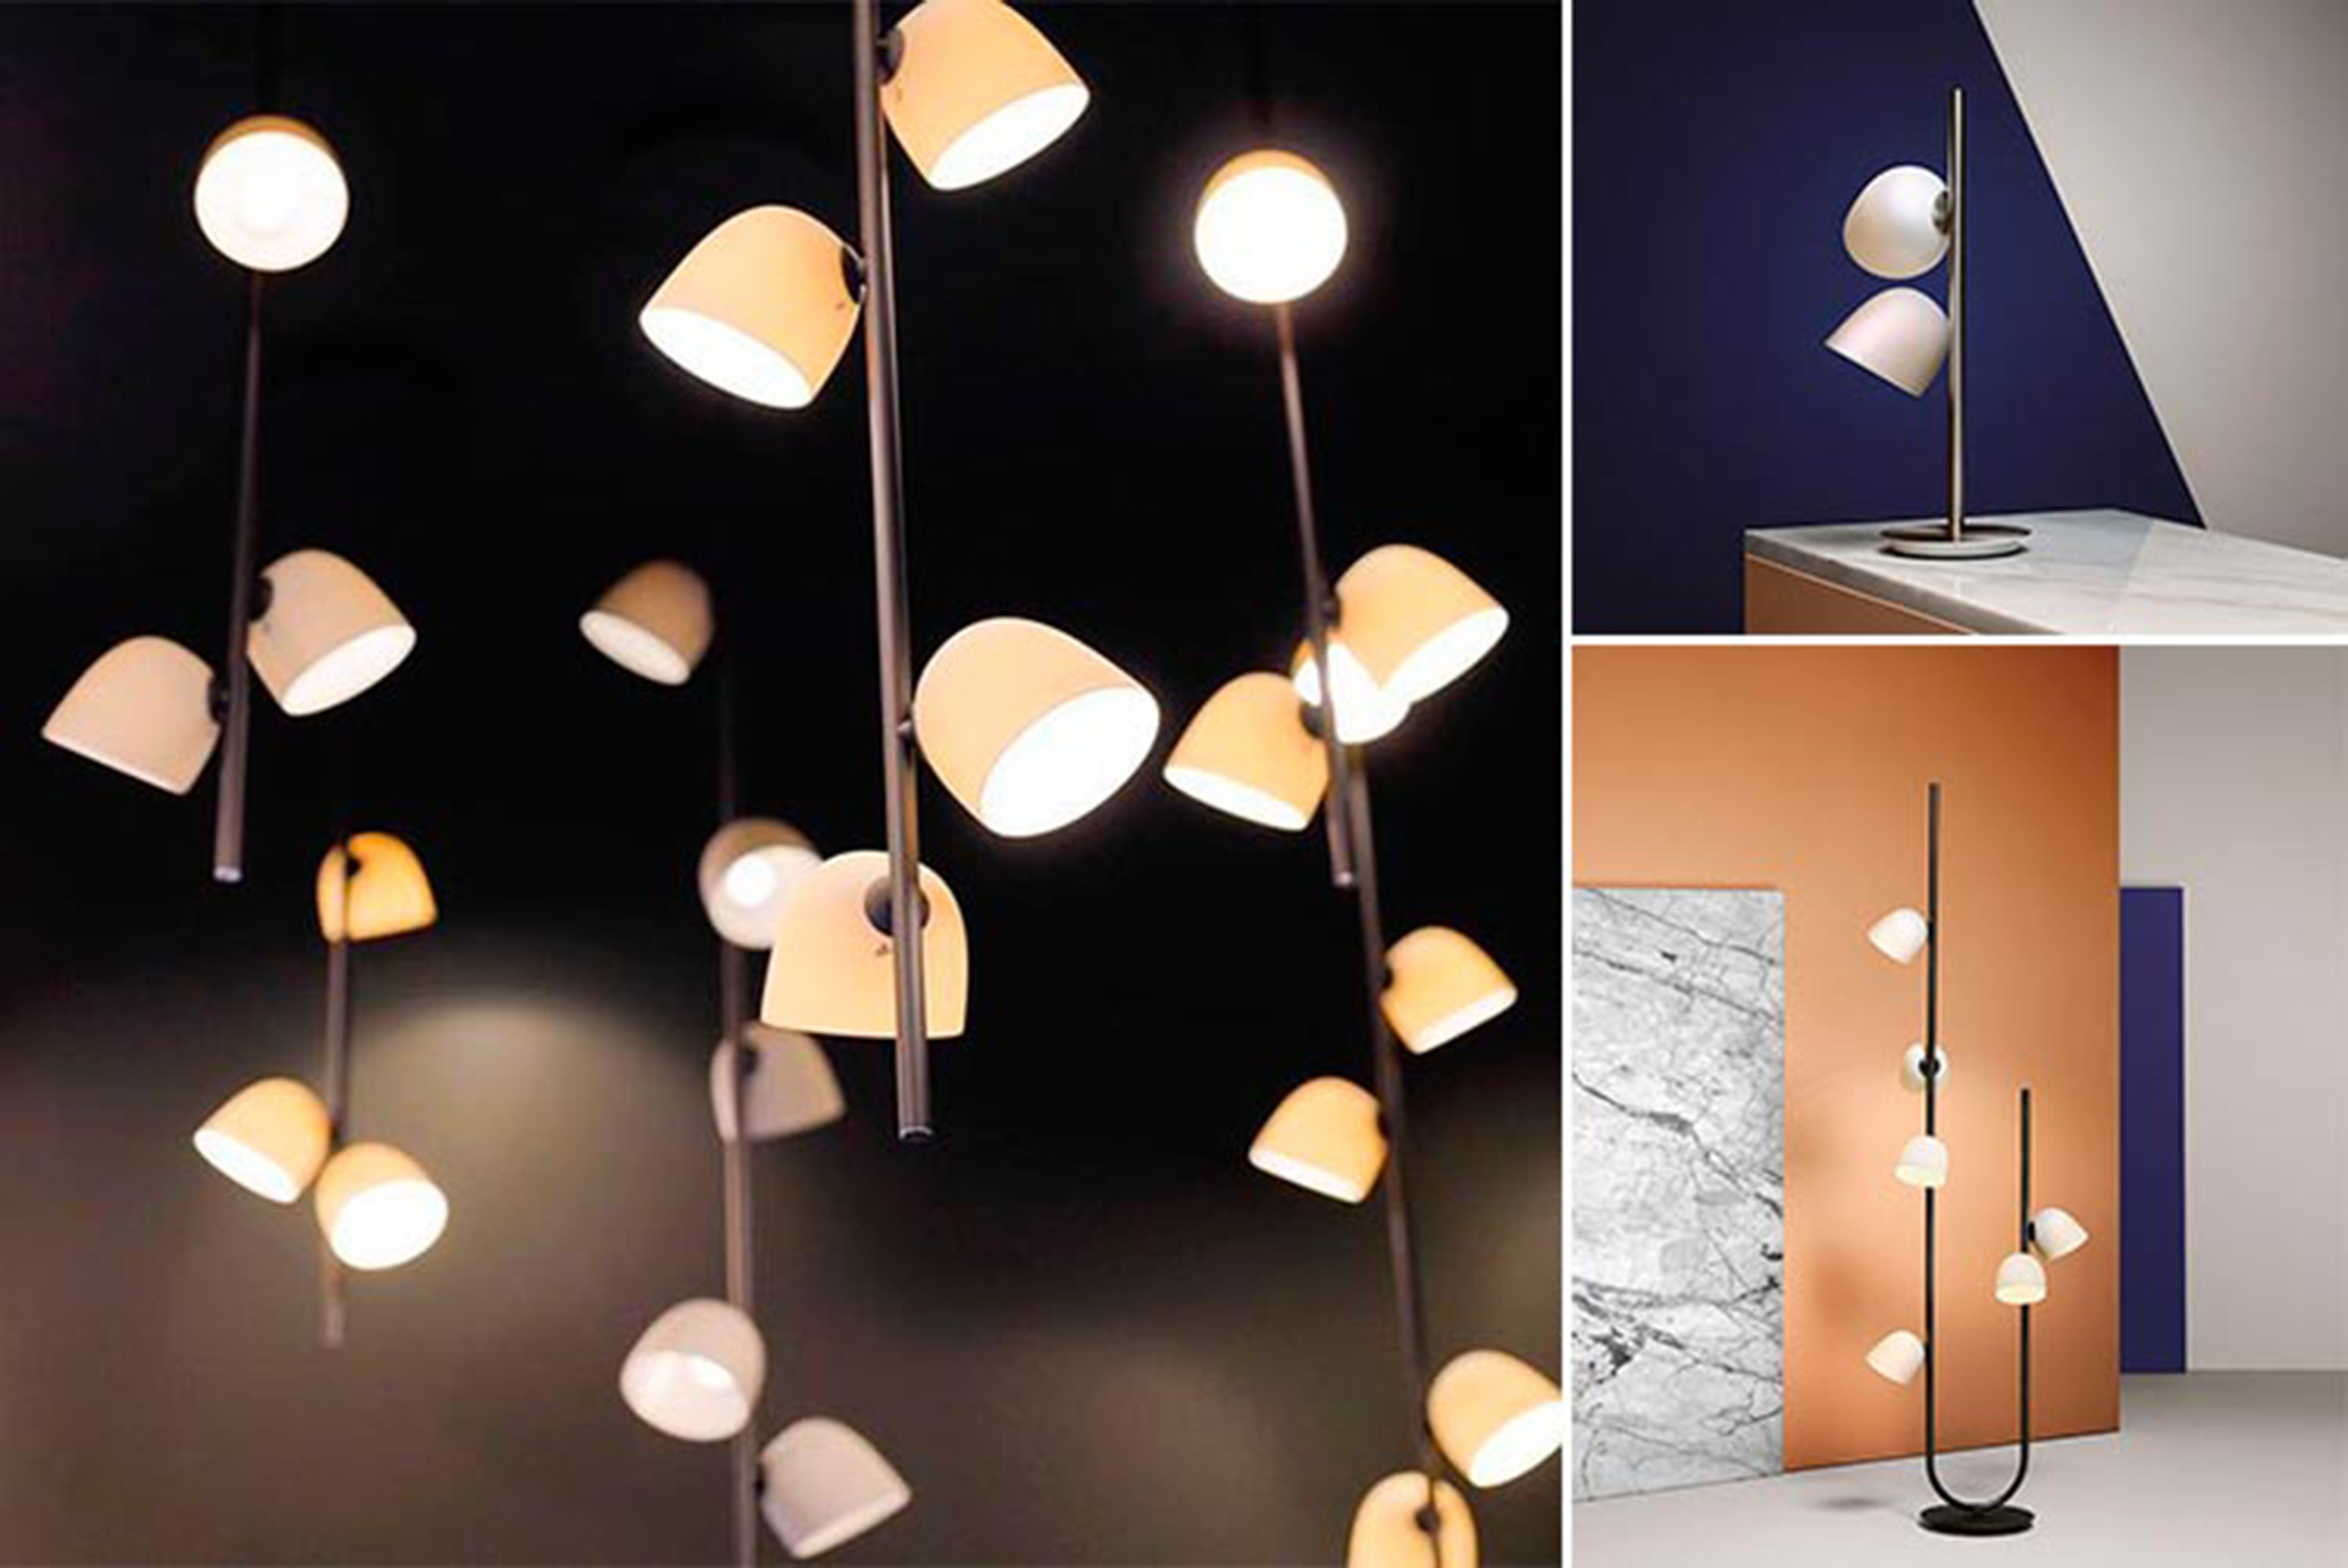 Interior Stylist & Curator Navin Kanodia reveals Maison & Objet